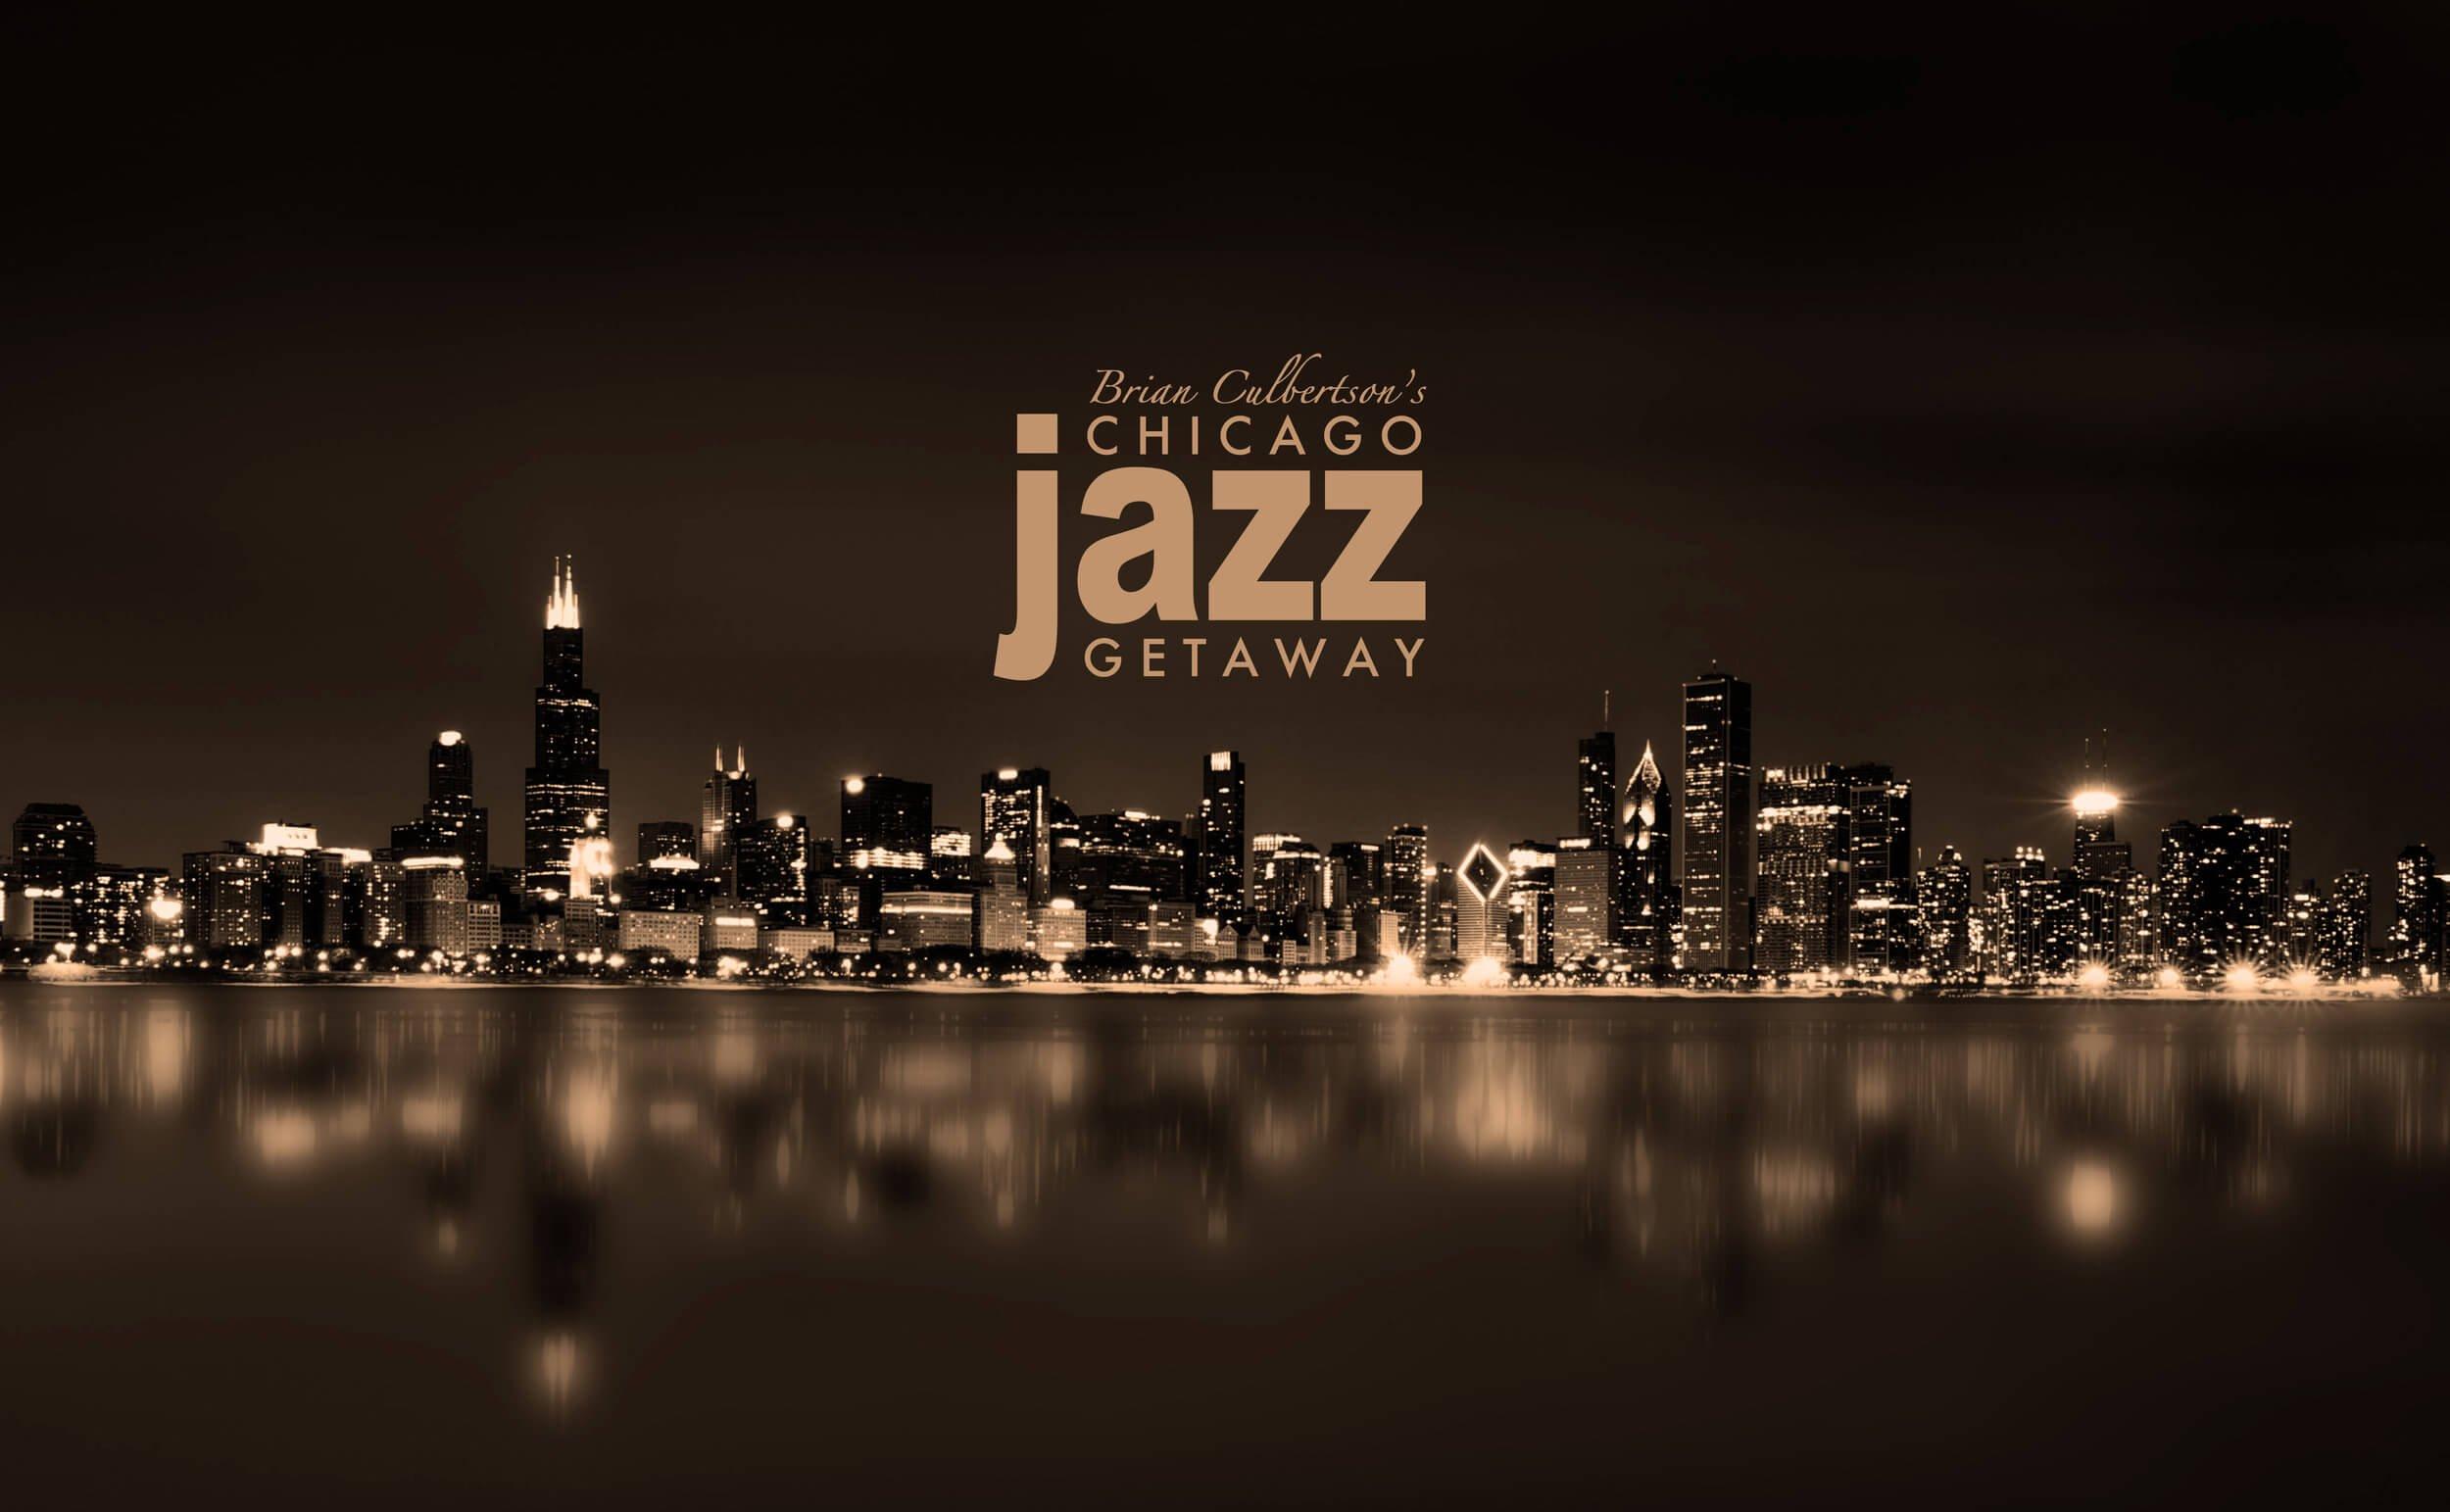 Brian Culbertson's Chicago Jazz Getaway 2020